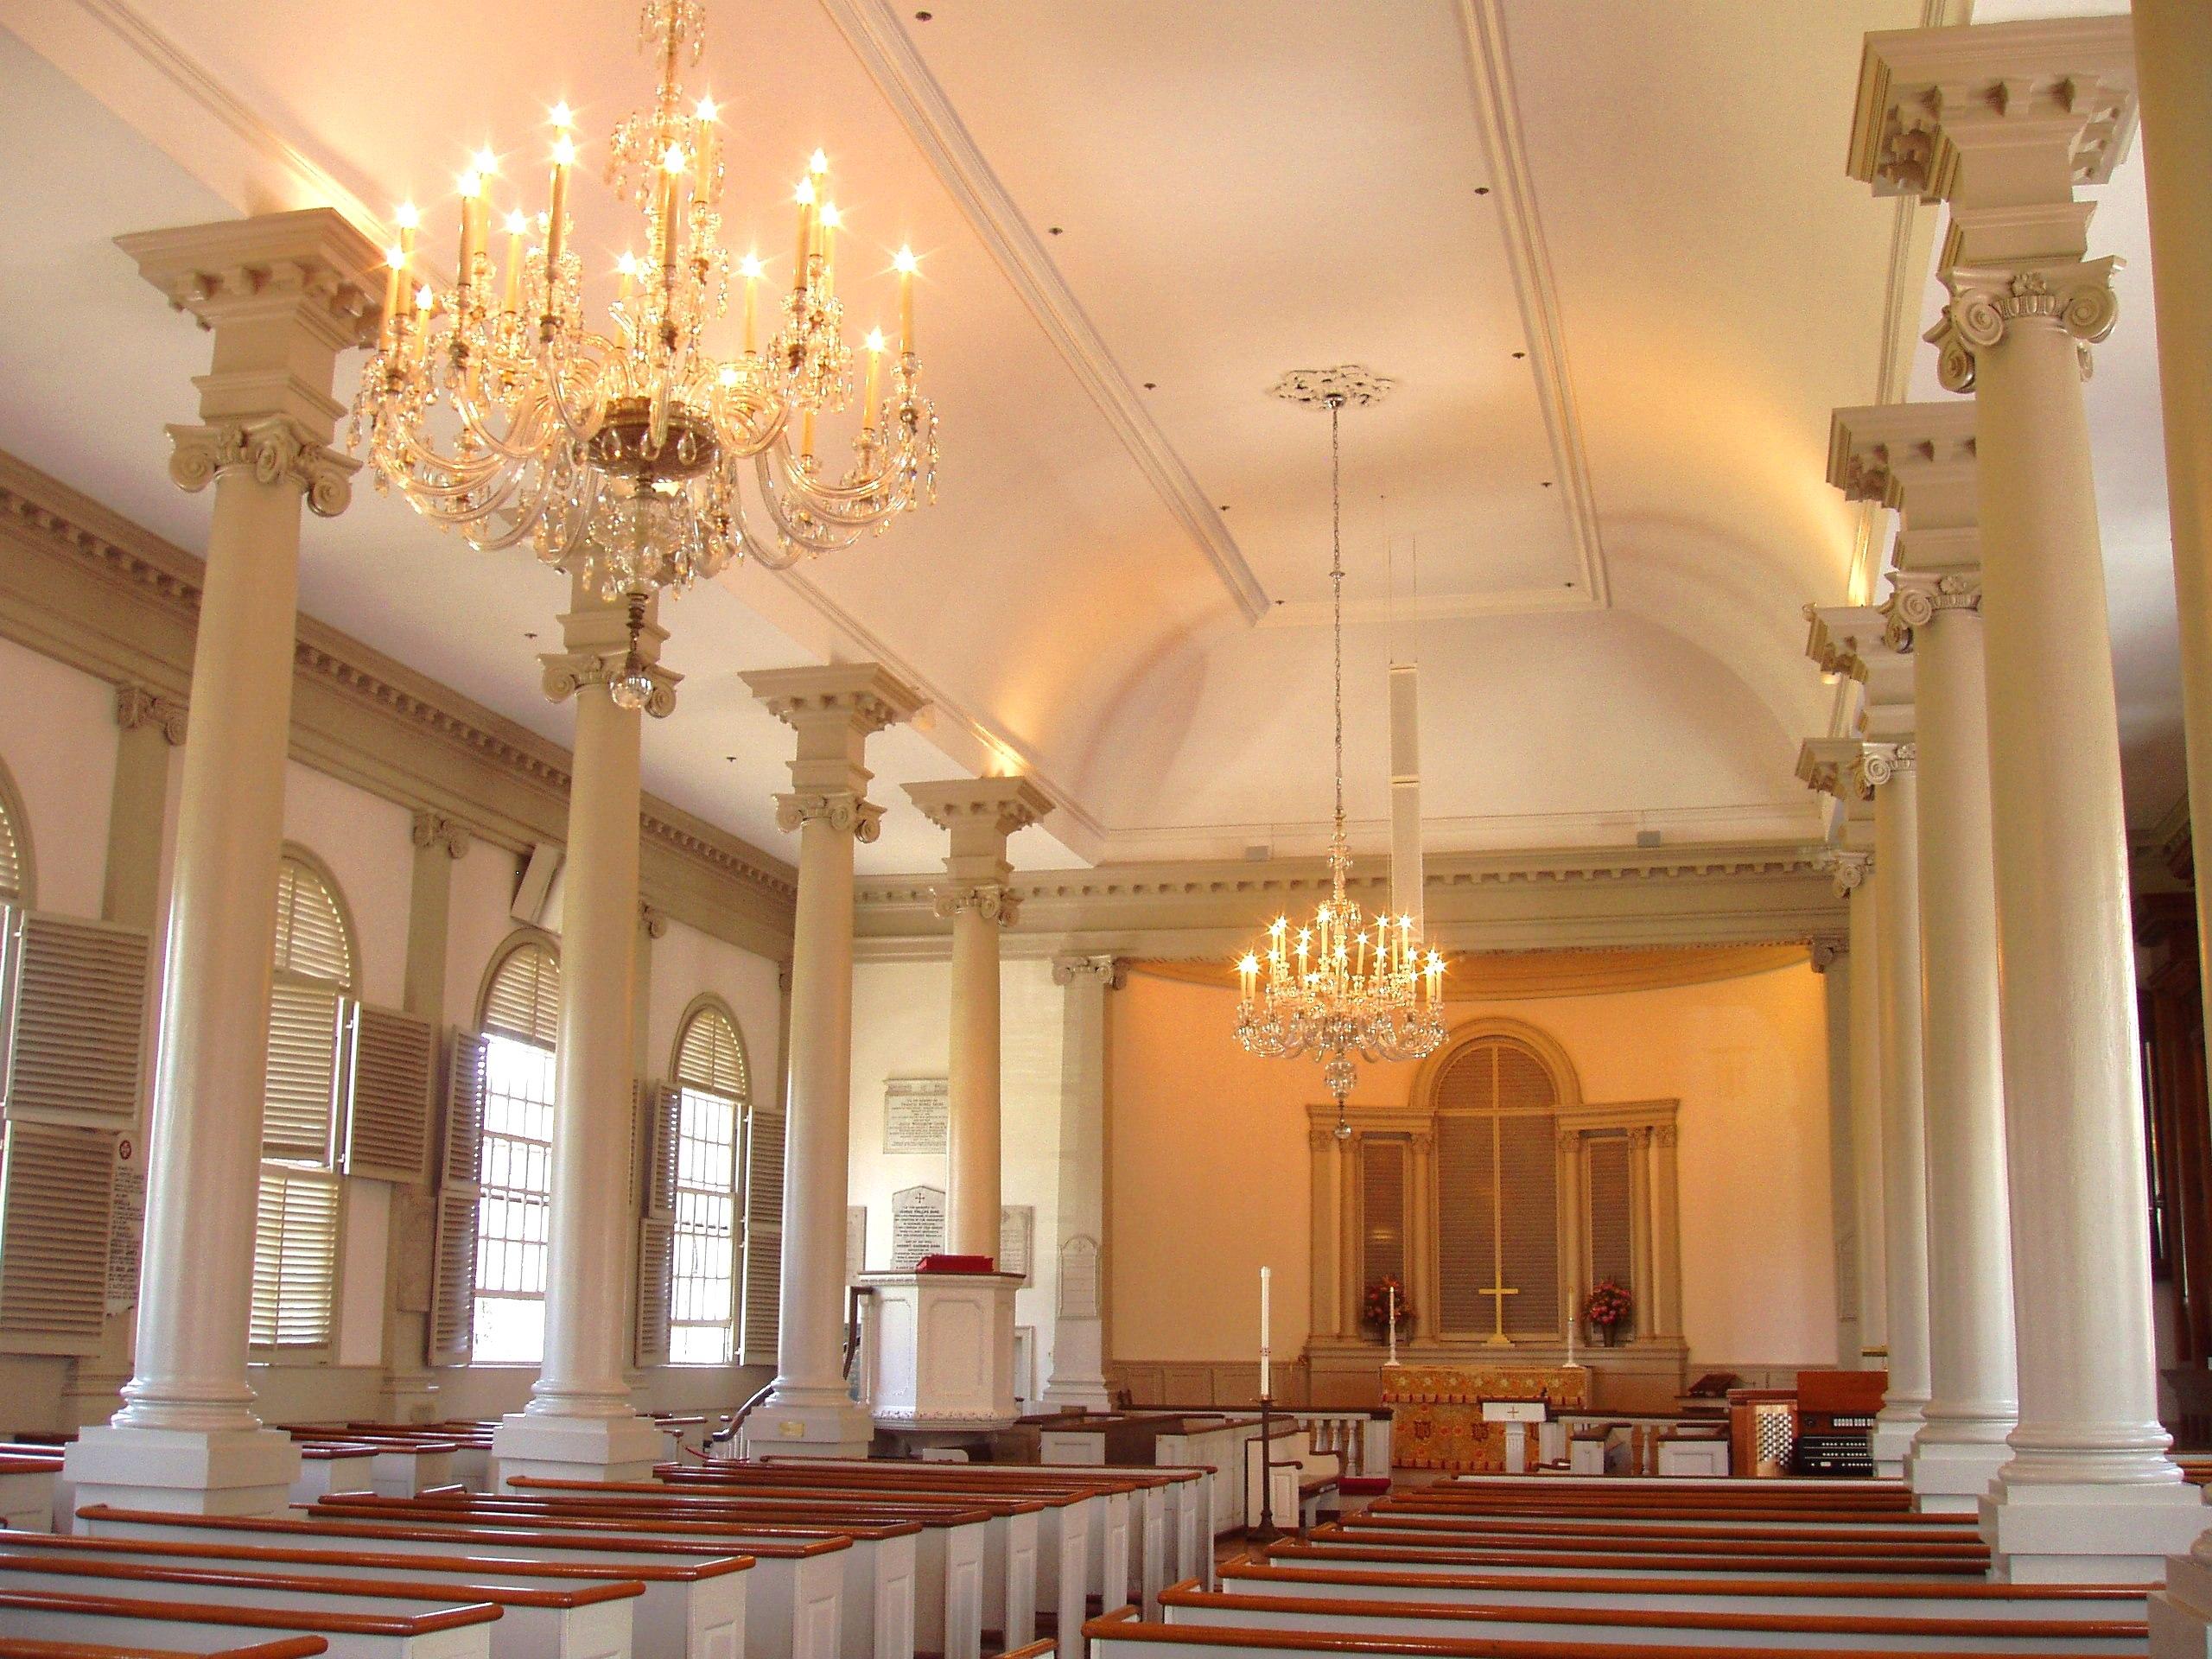 Christ Church interior.